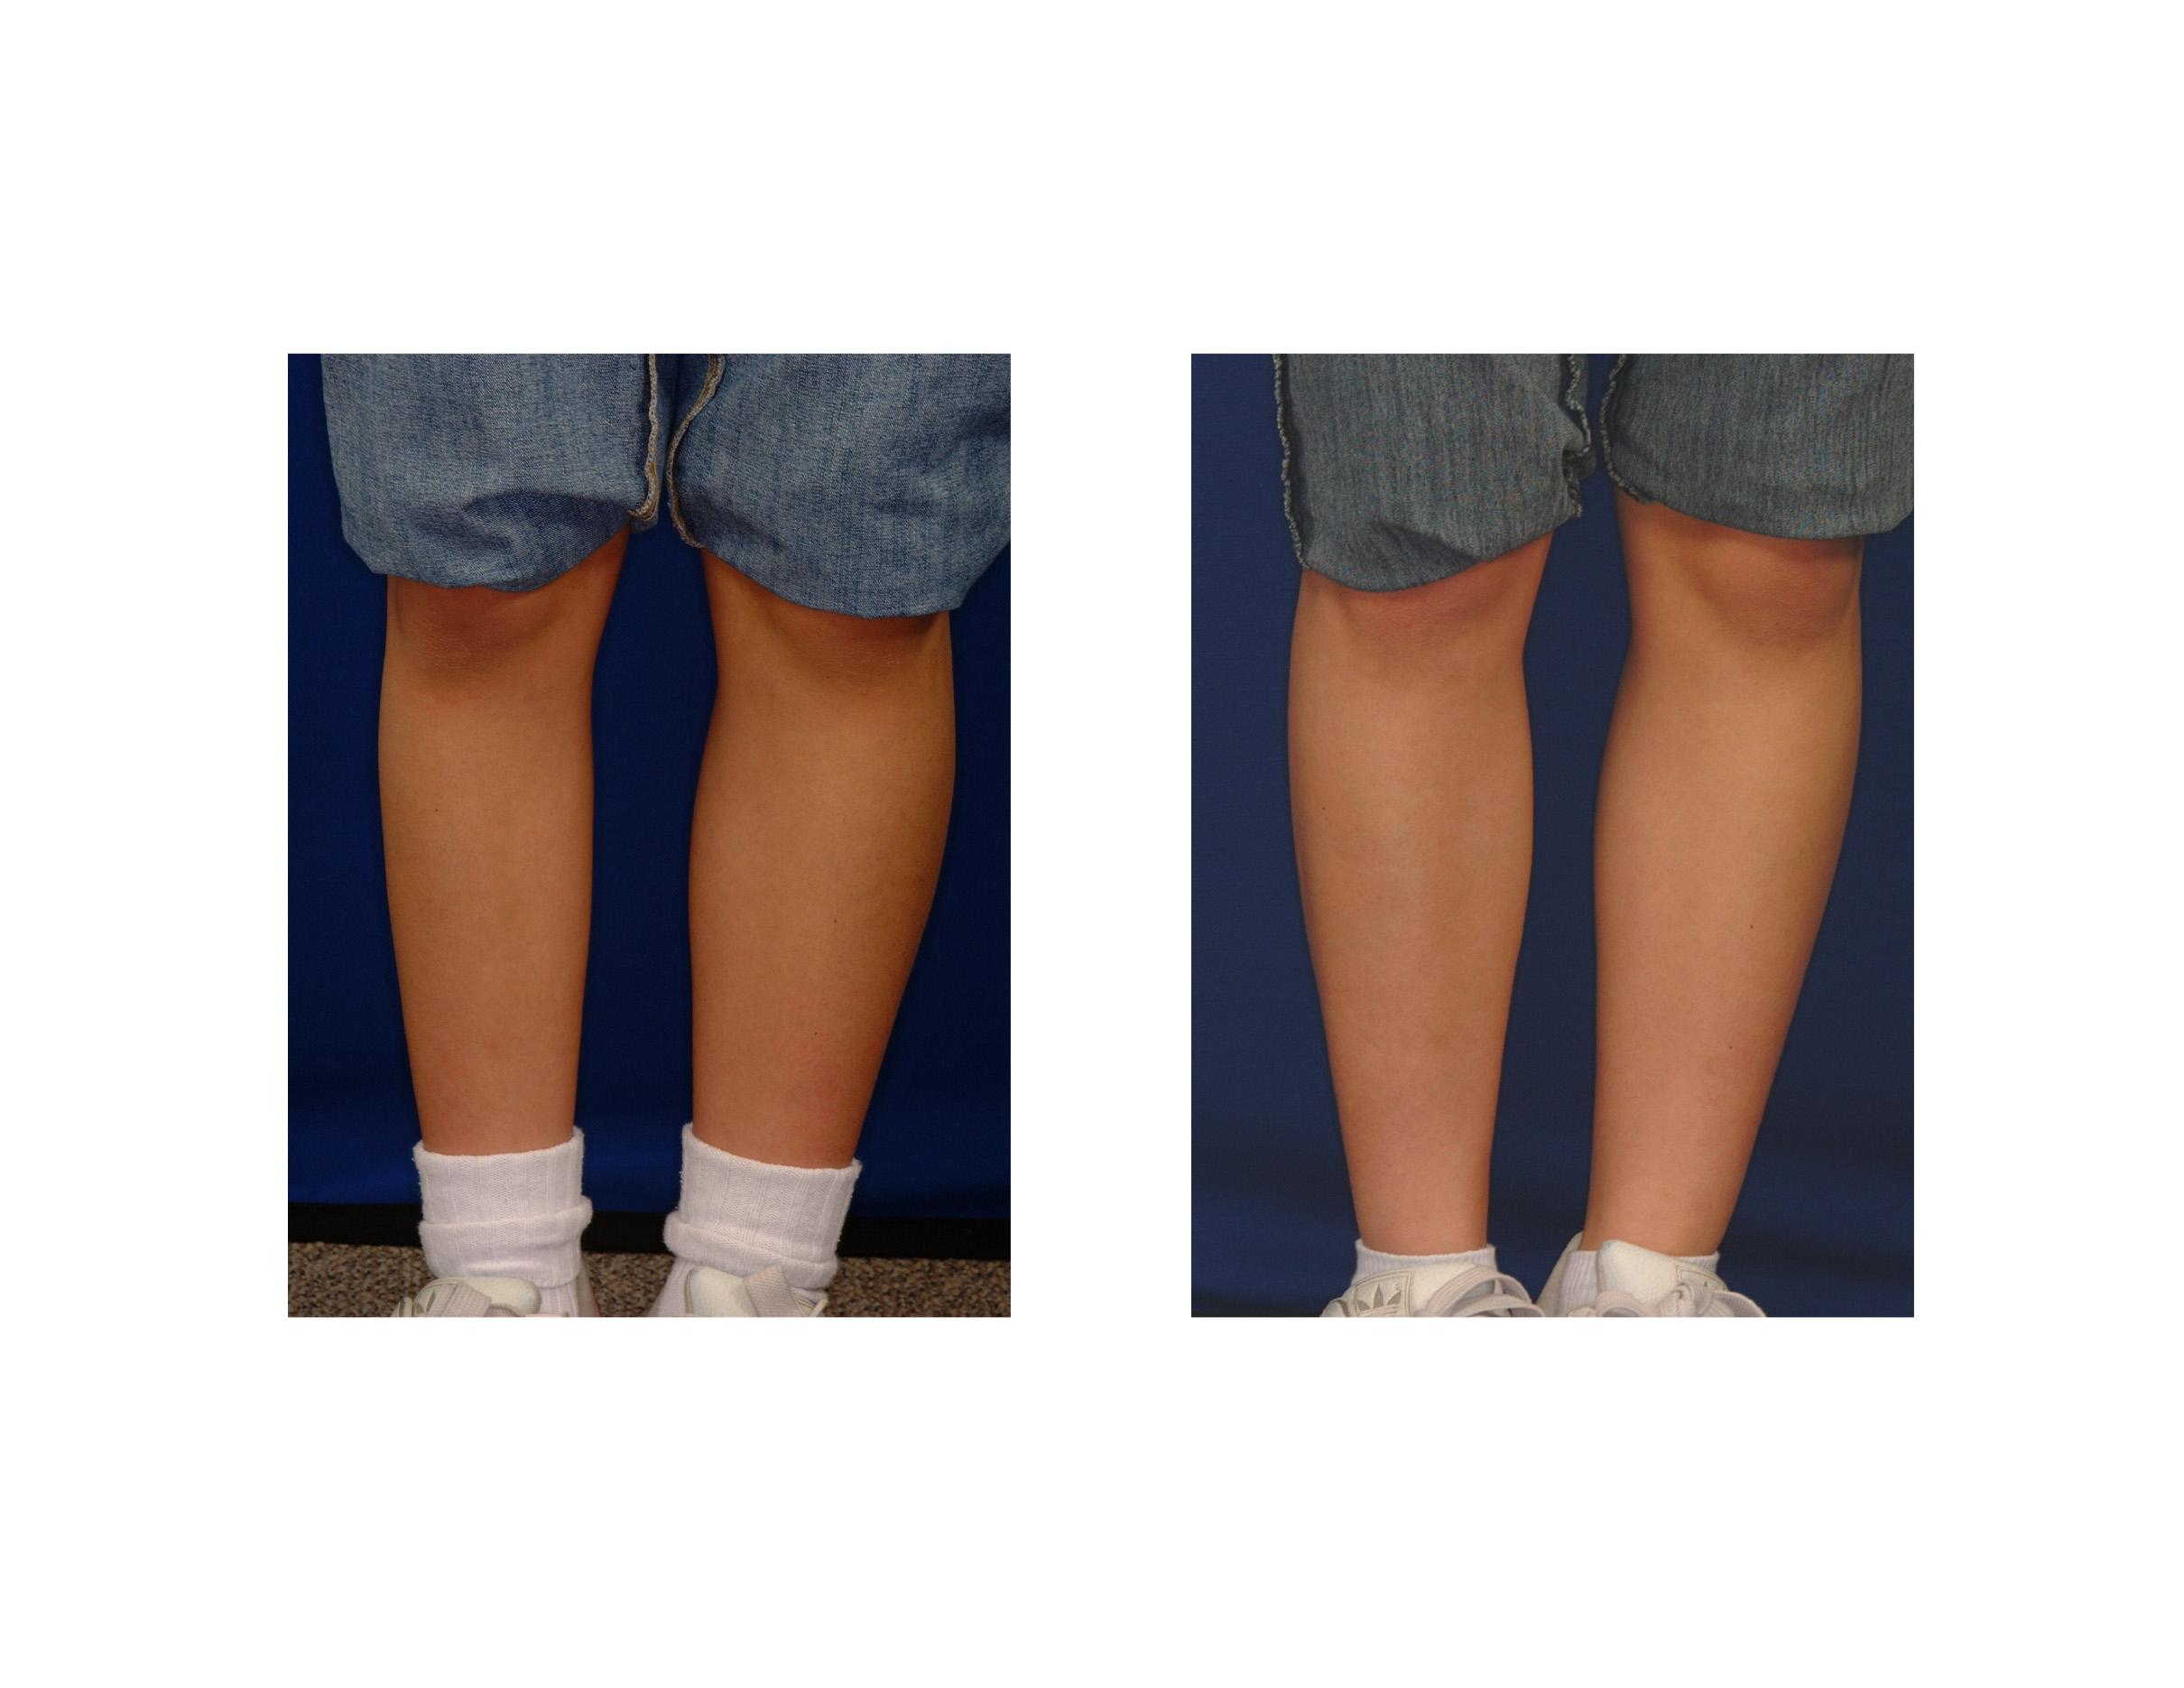 calf augmentation Archives